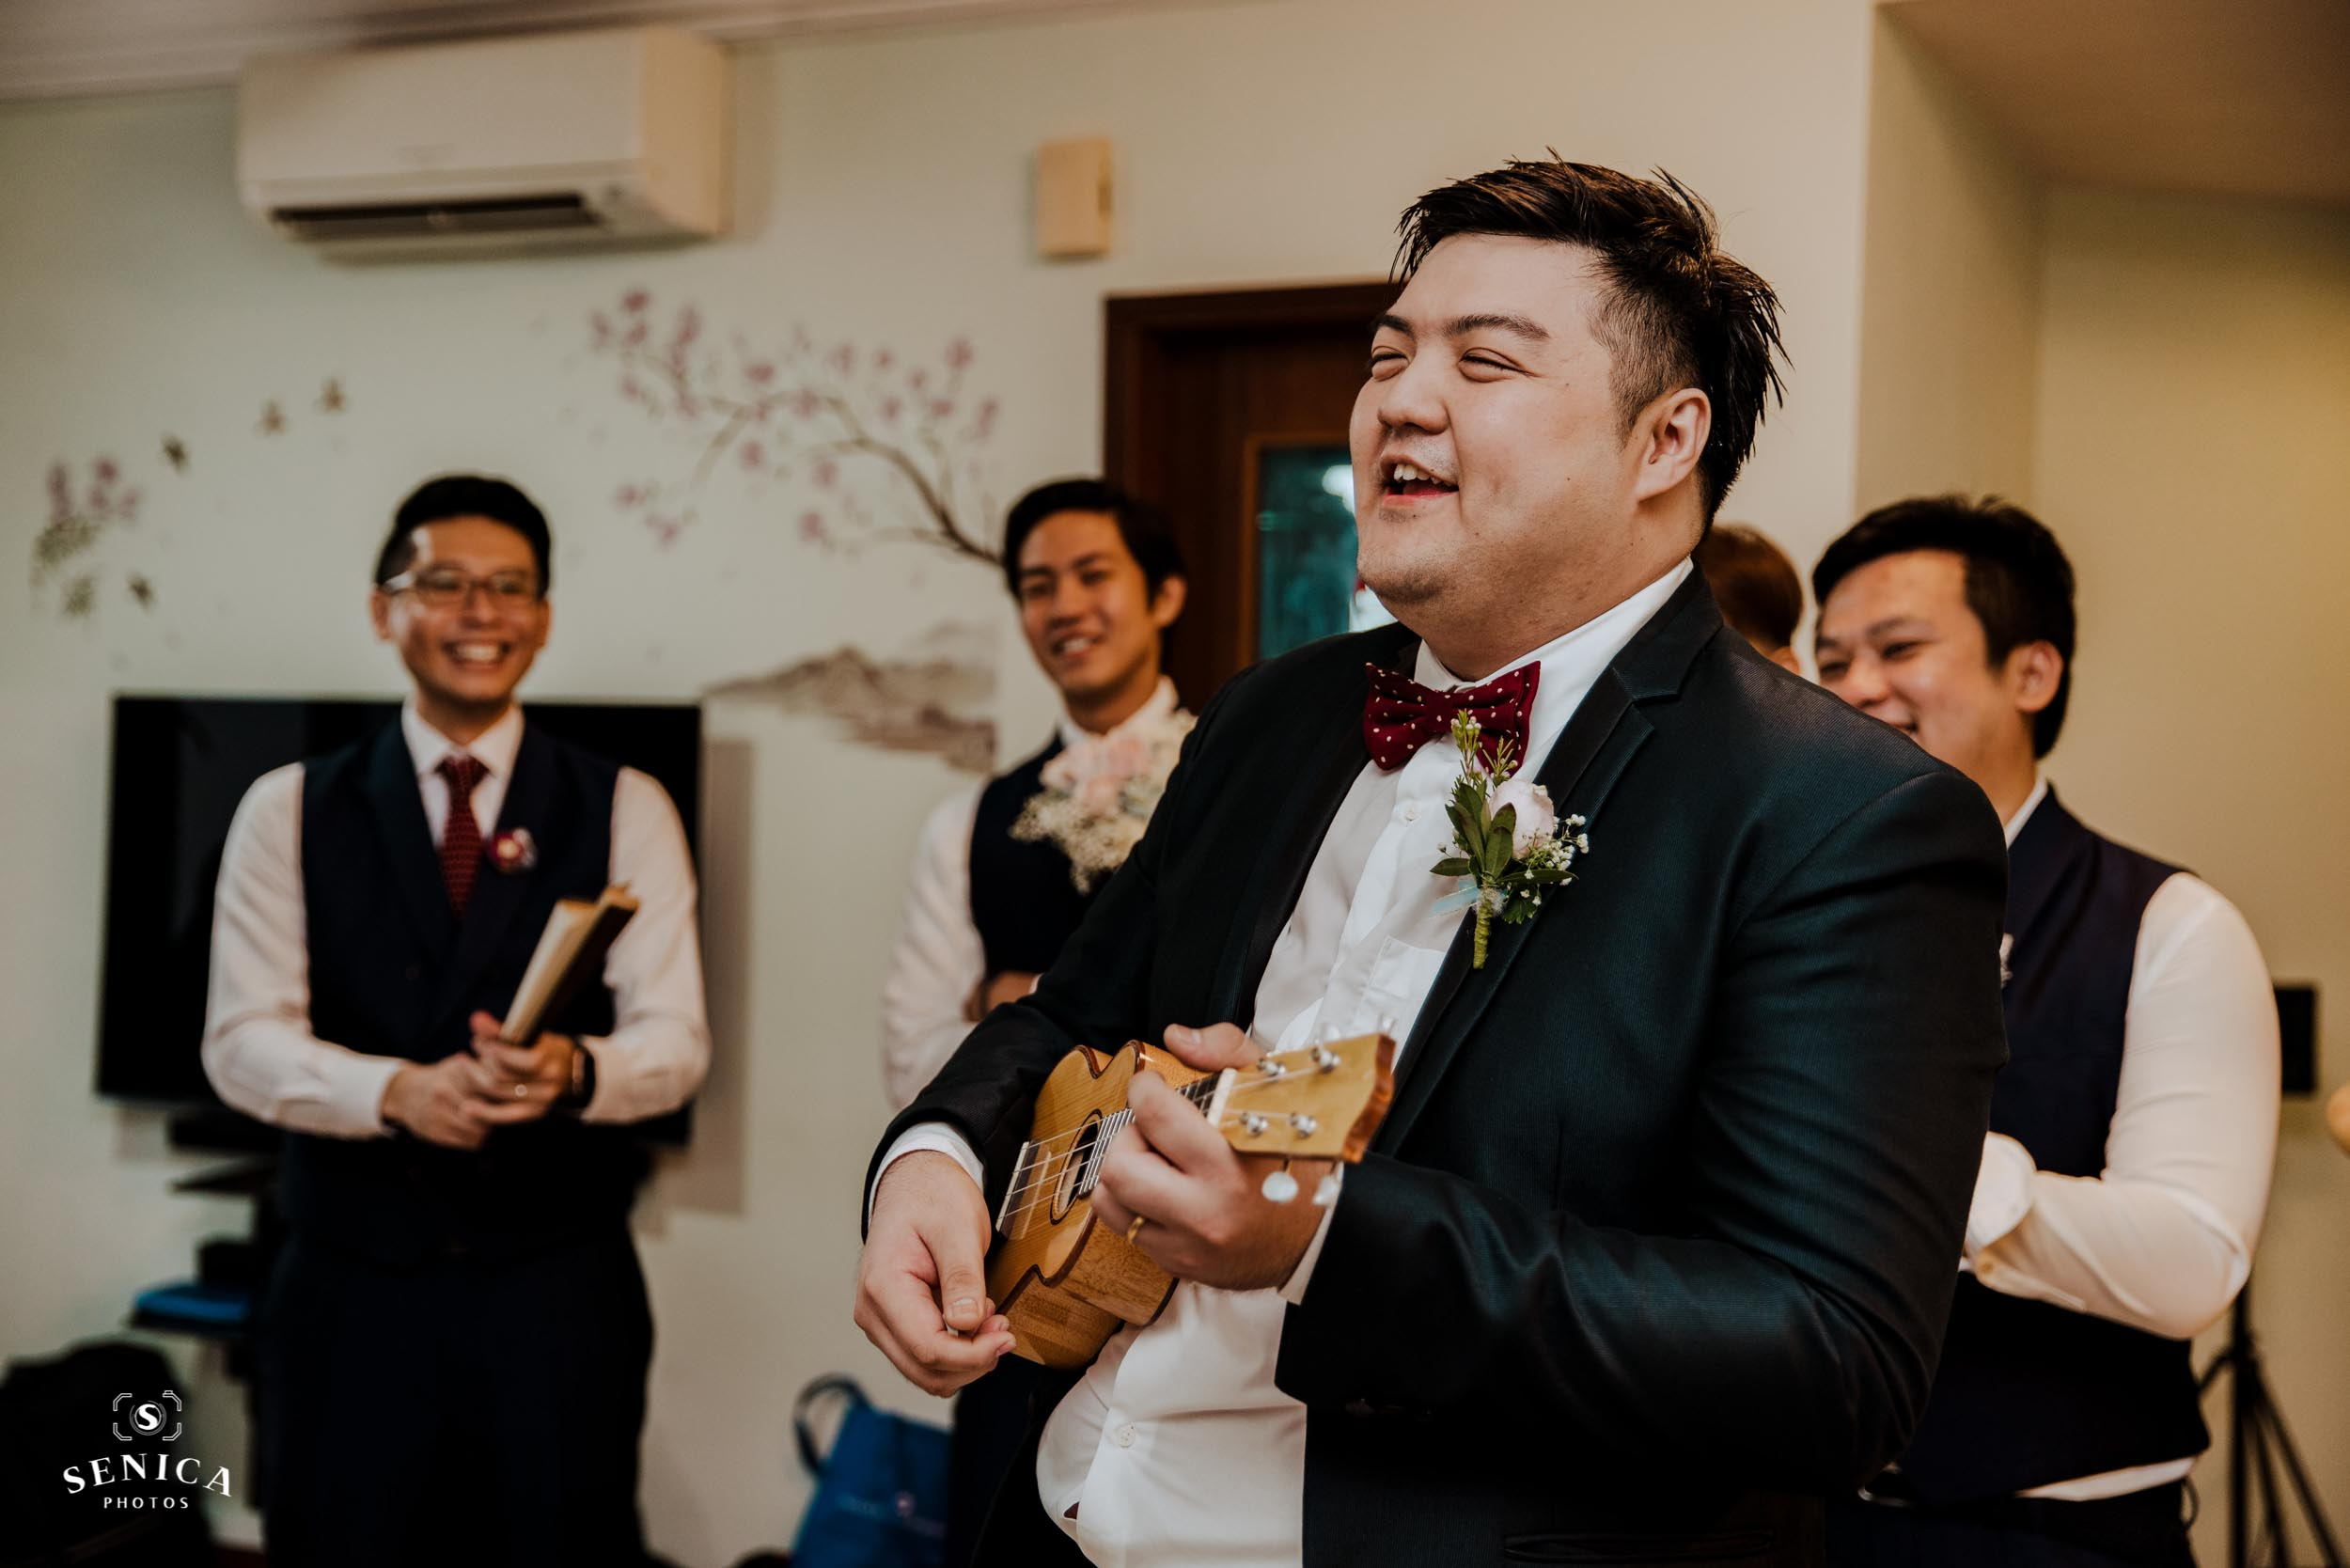 Groom singing for bride's family members